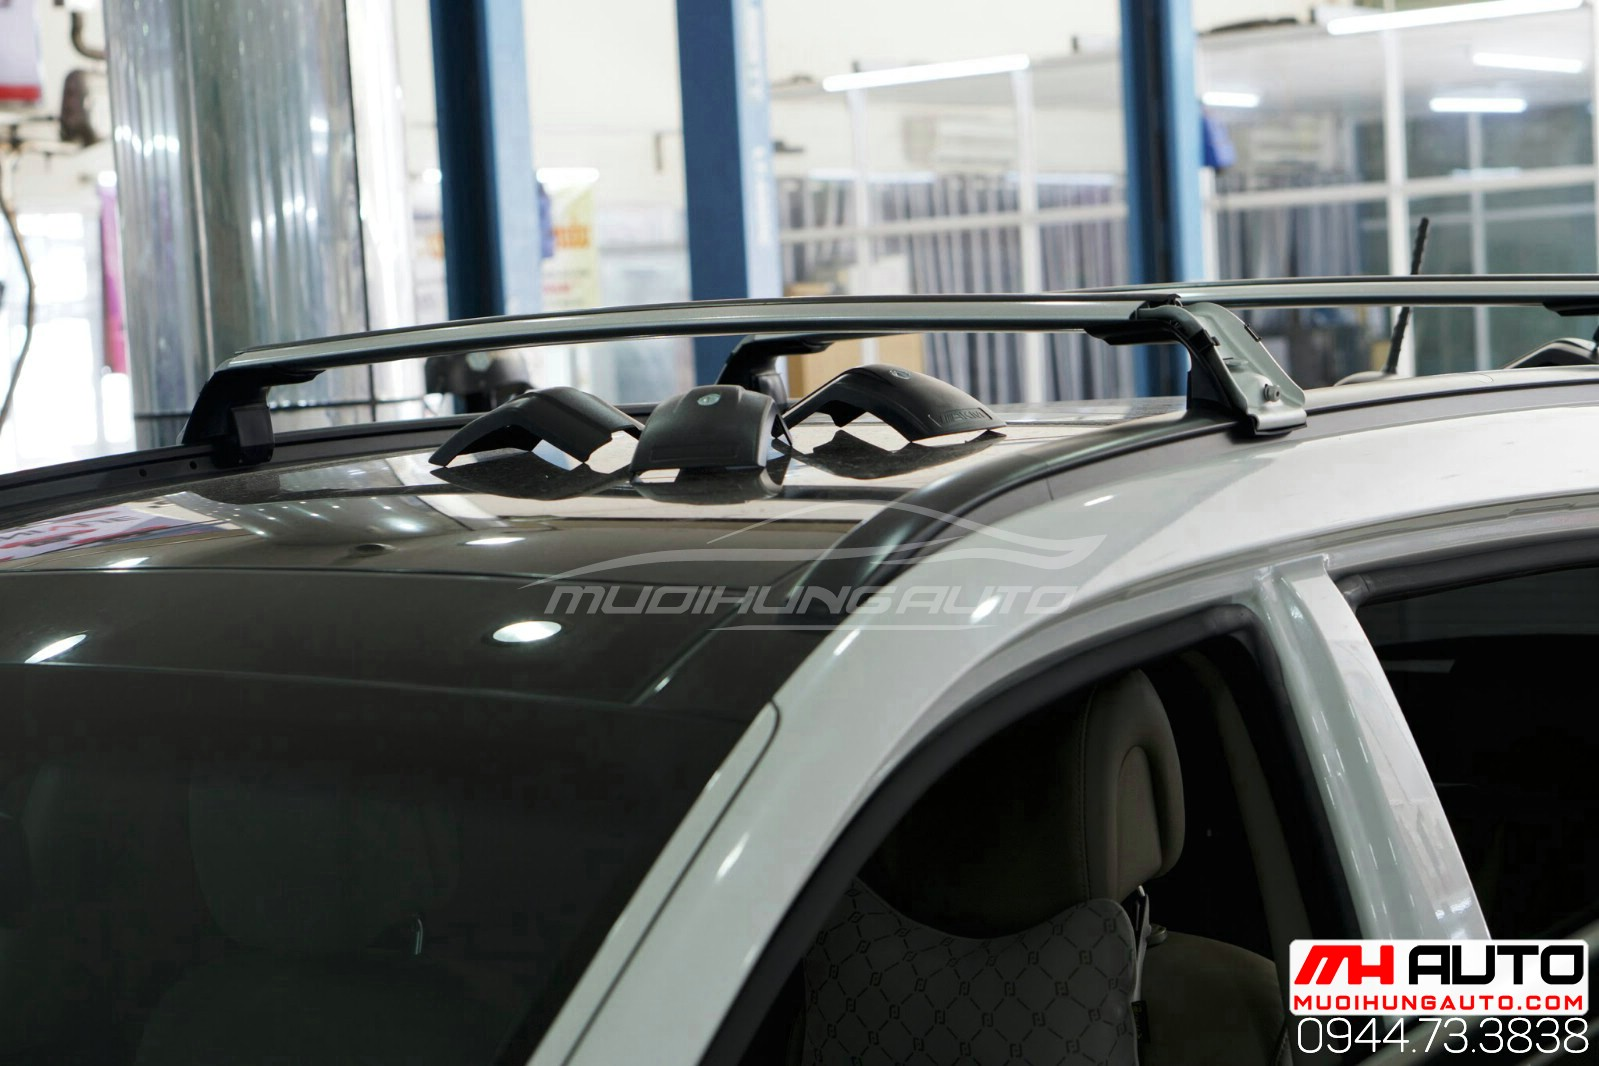 phụ kiện ba ga mui để đồ xe Hyundai Santafe 2018